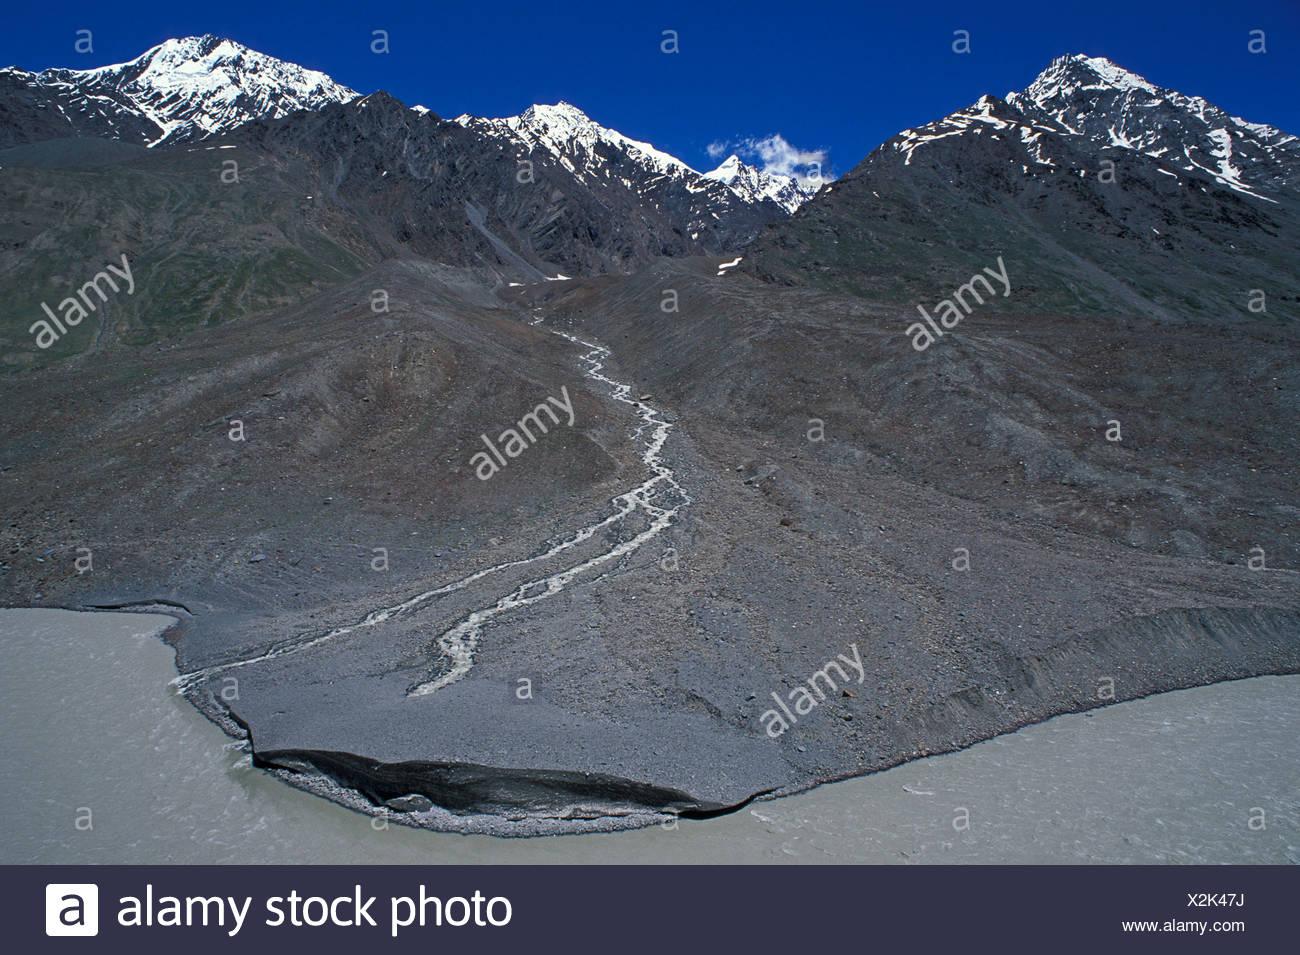 Picco in prossimità il Kunzum Pass, Himachal Pradesh, Himalaya, Nord India, India, Asia Immagini Stock